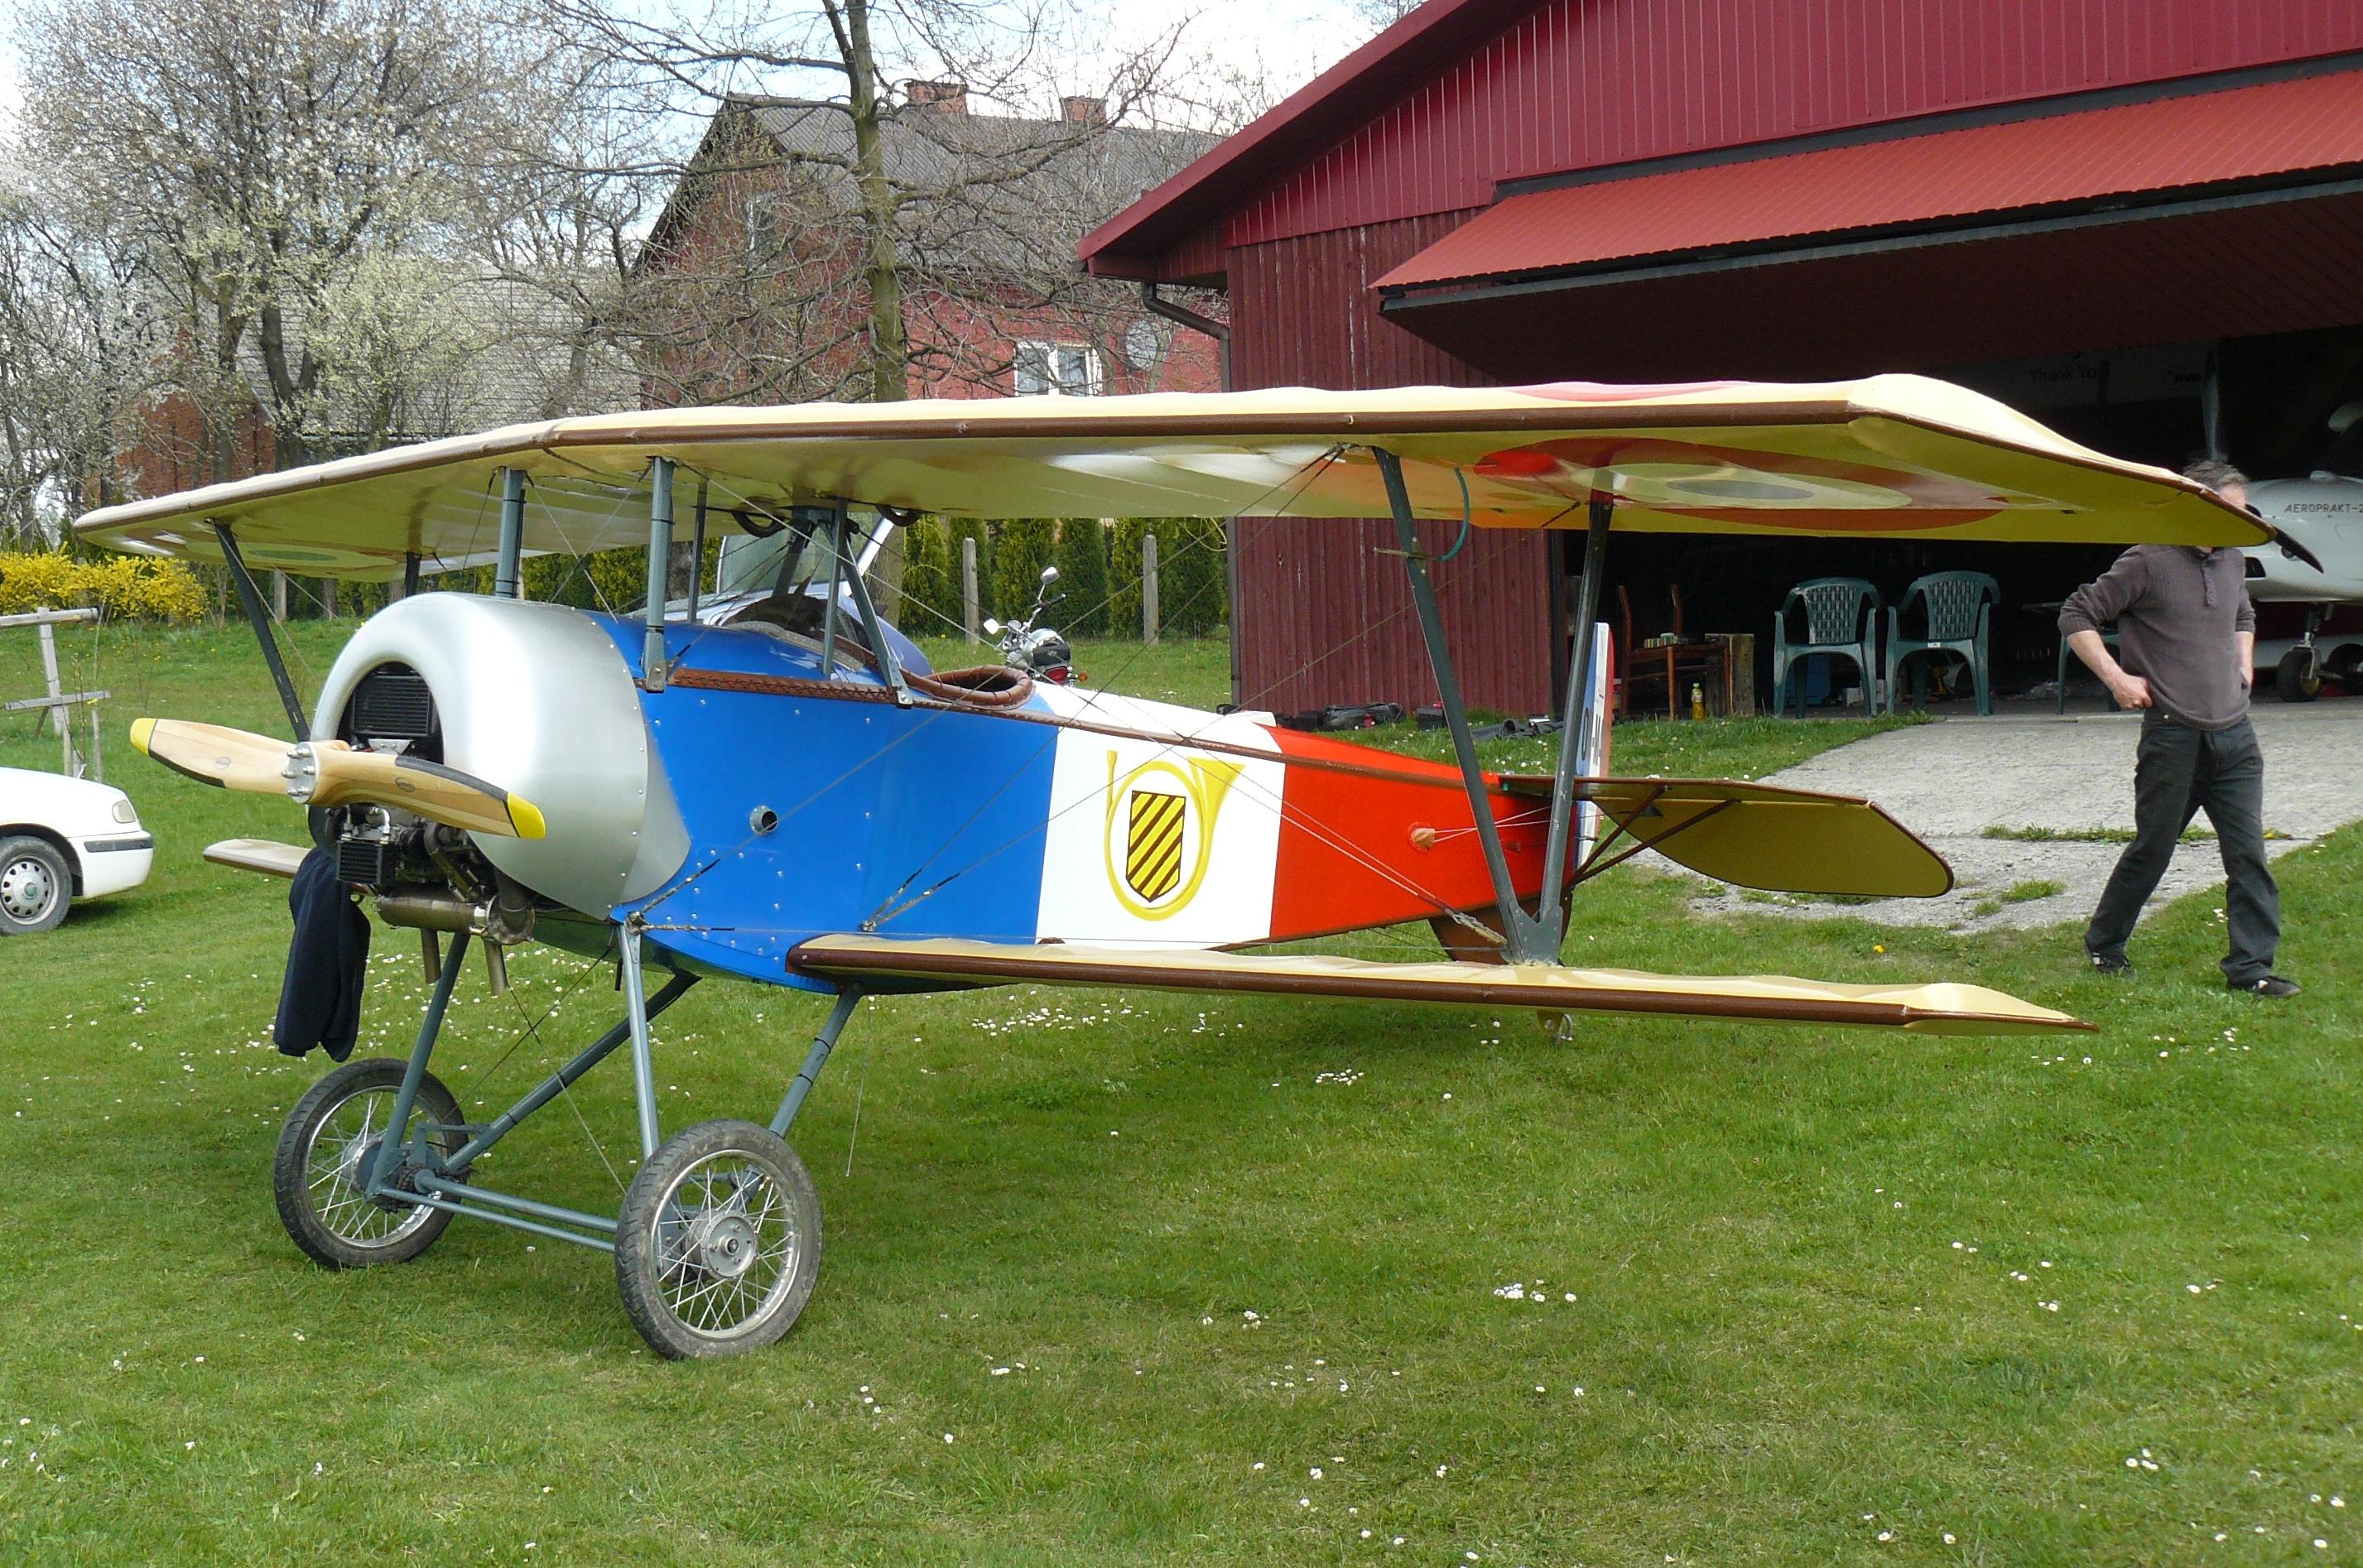 File:Nieuport 11, replika, ultralight.JPG